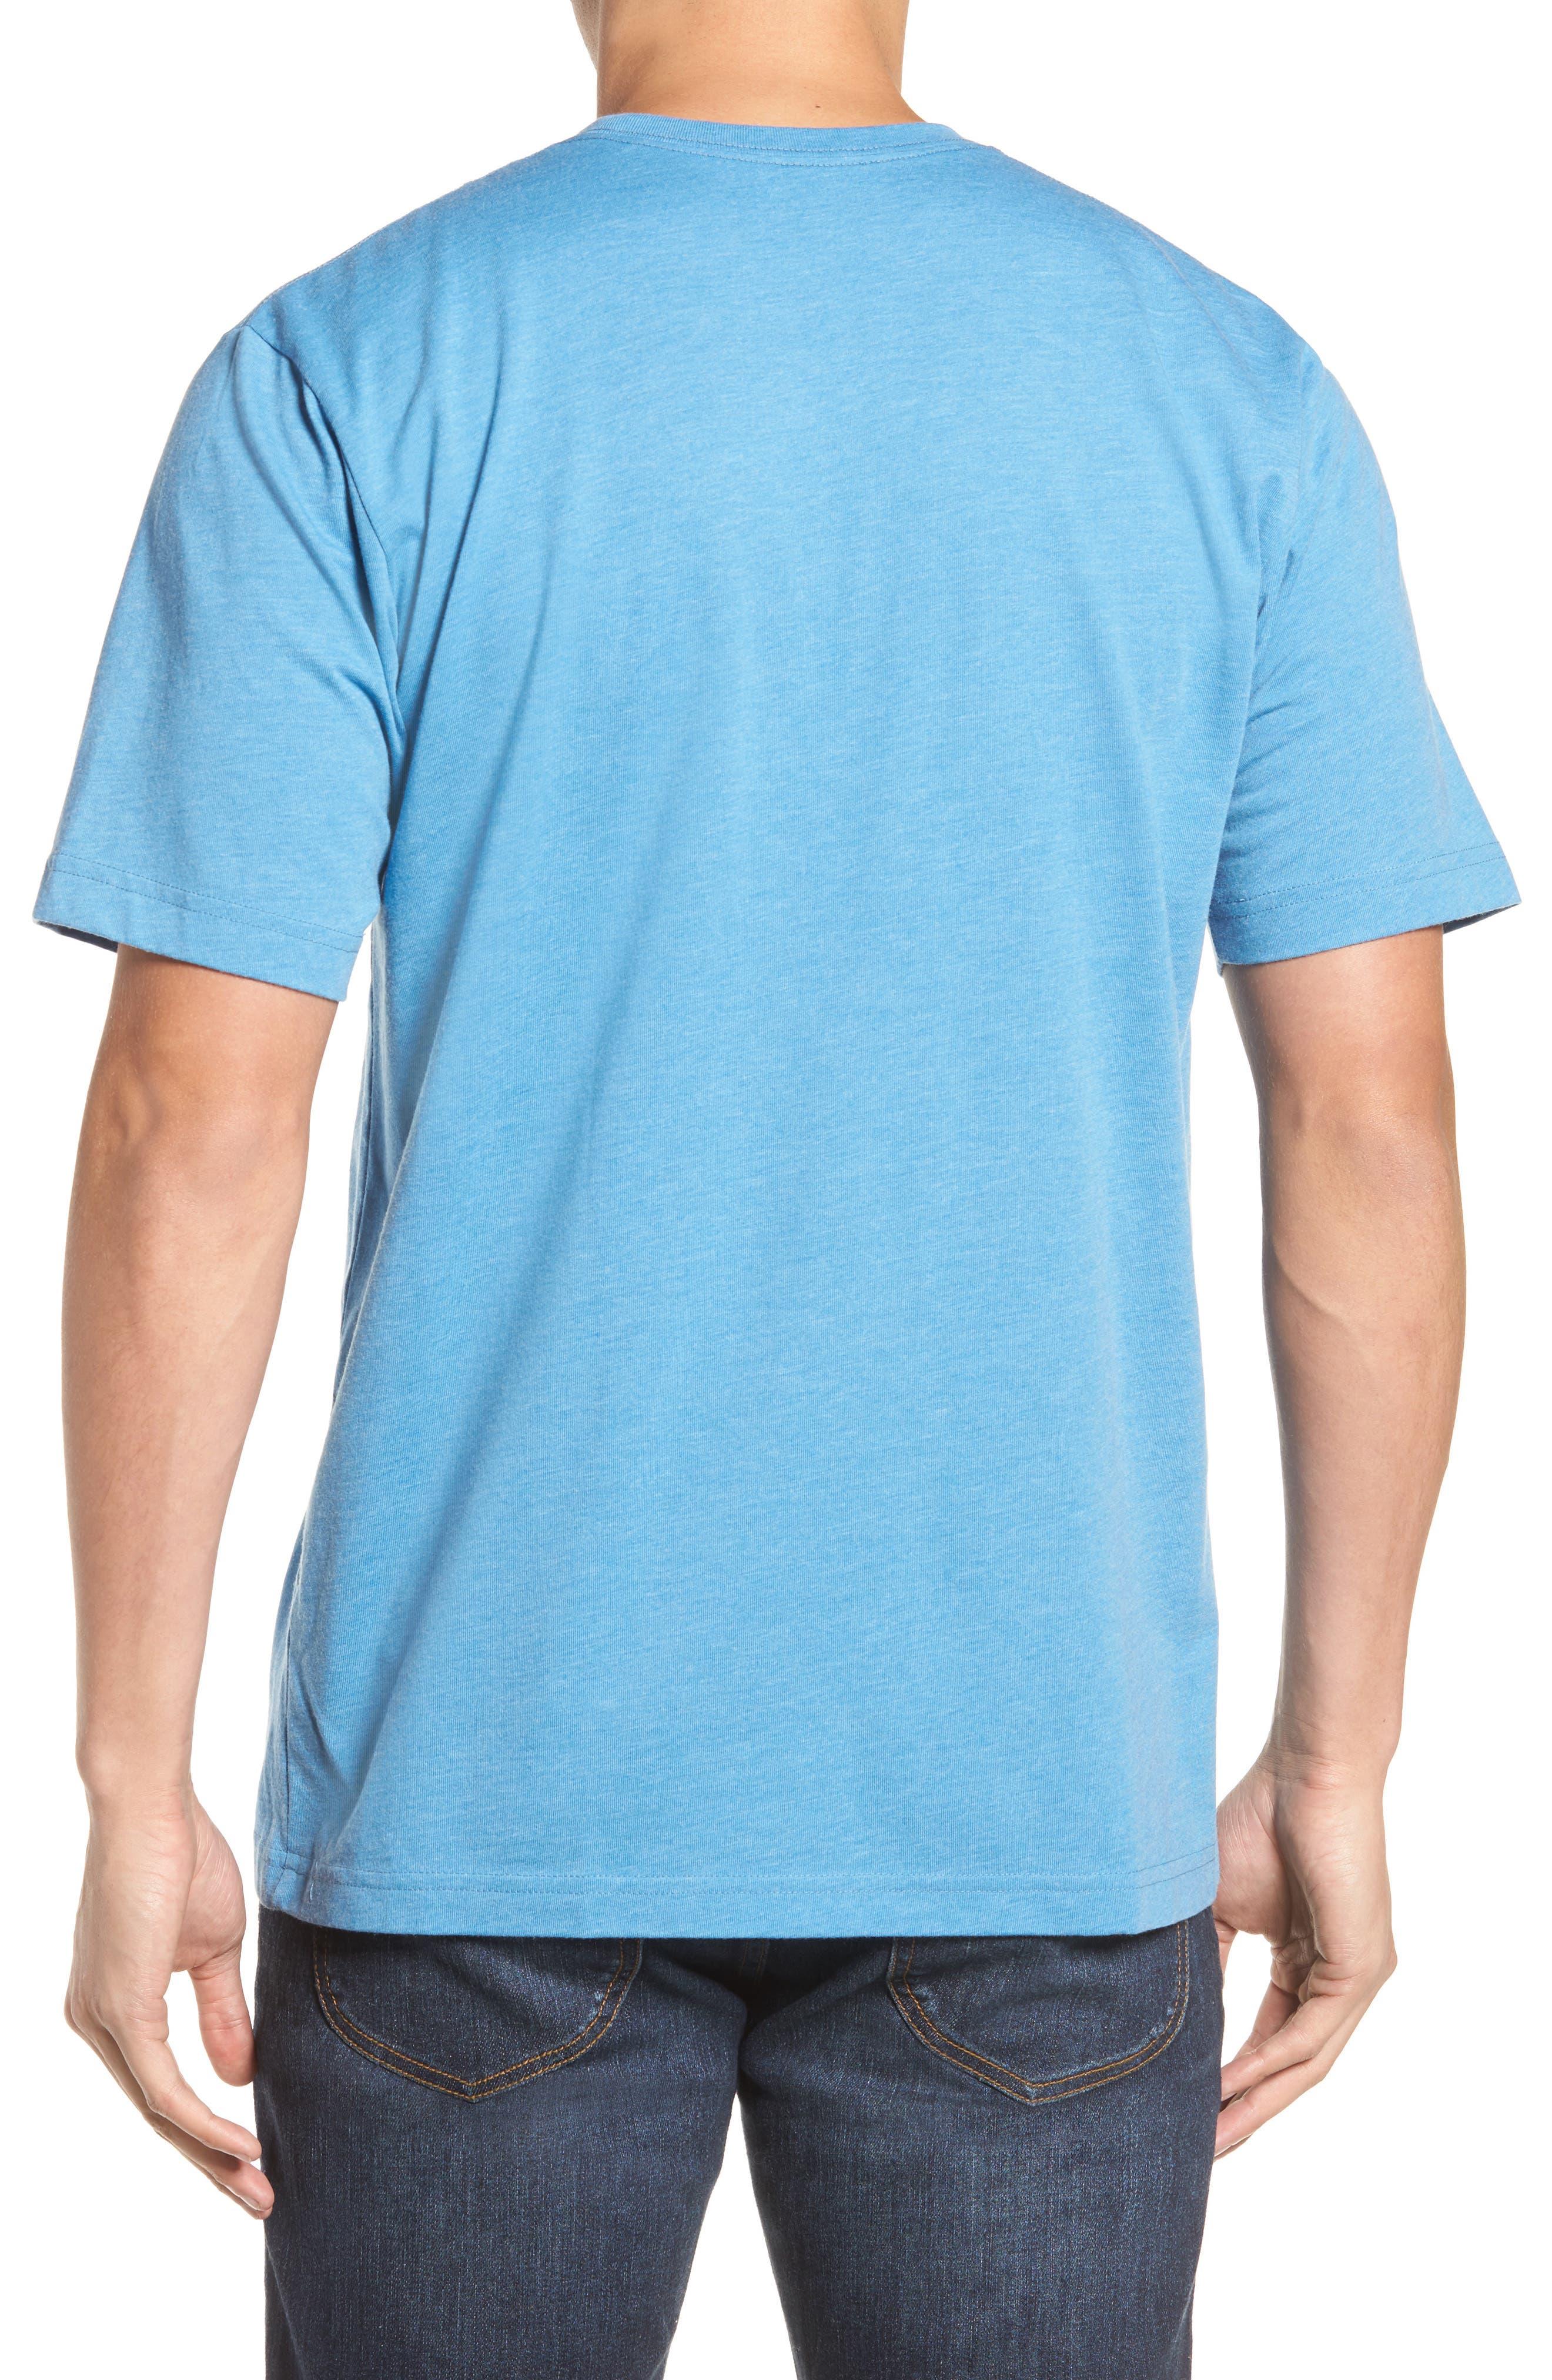 Utah T-Shirt,                             Alternate thumbnail 2, color,                             400